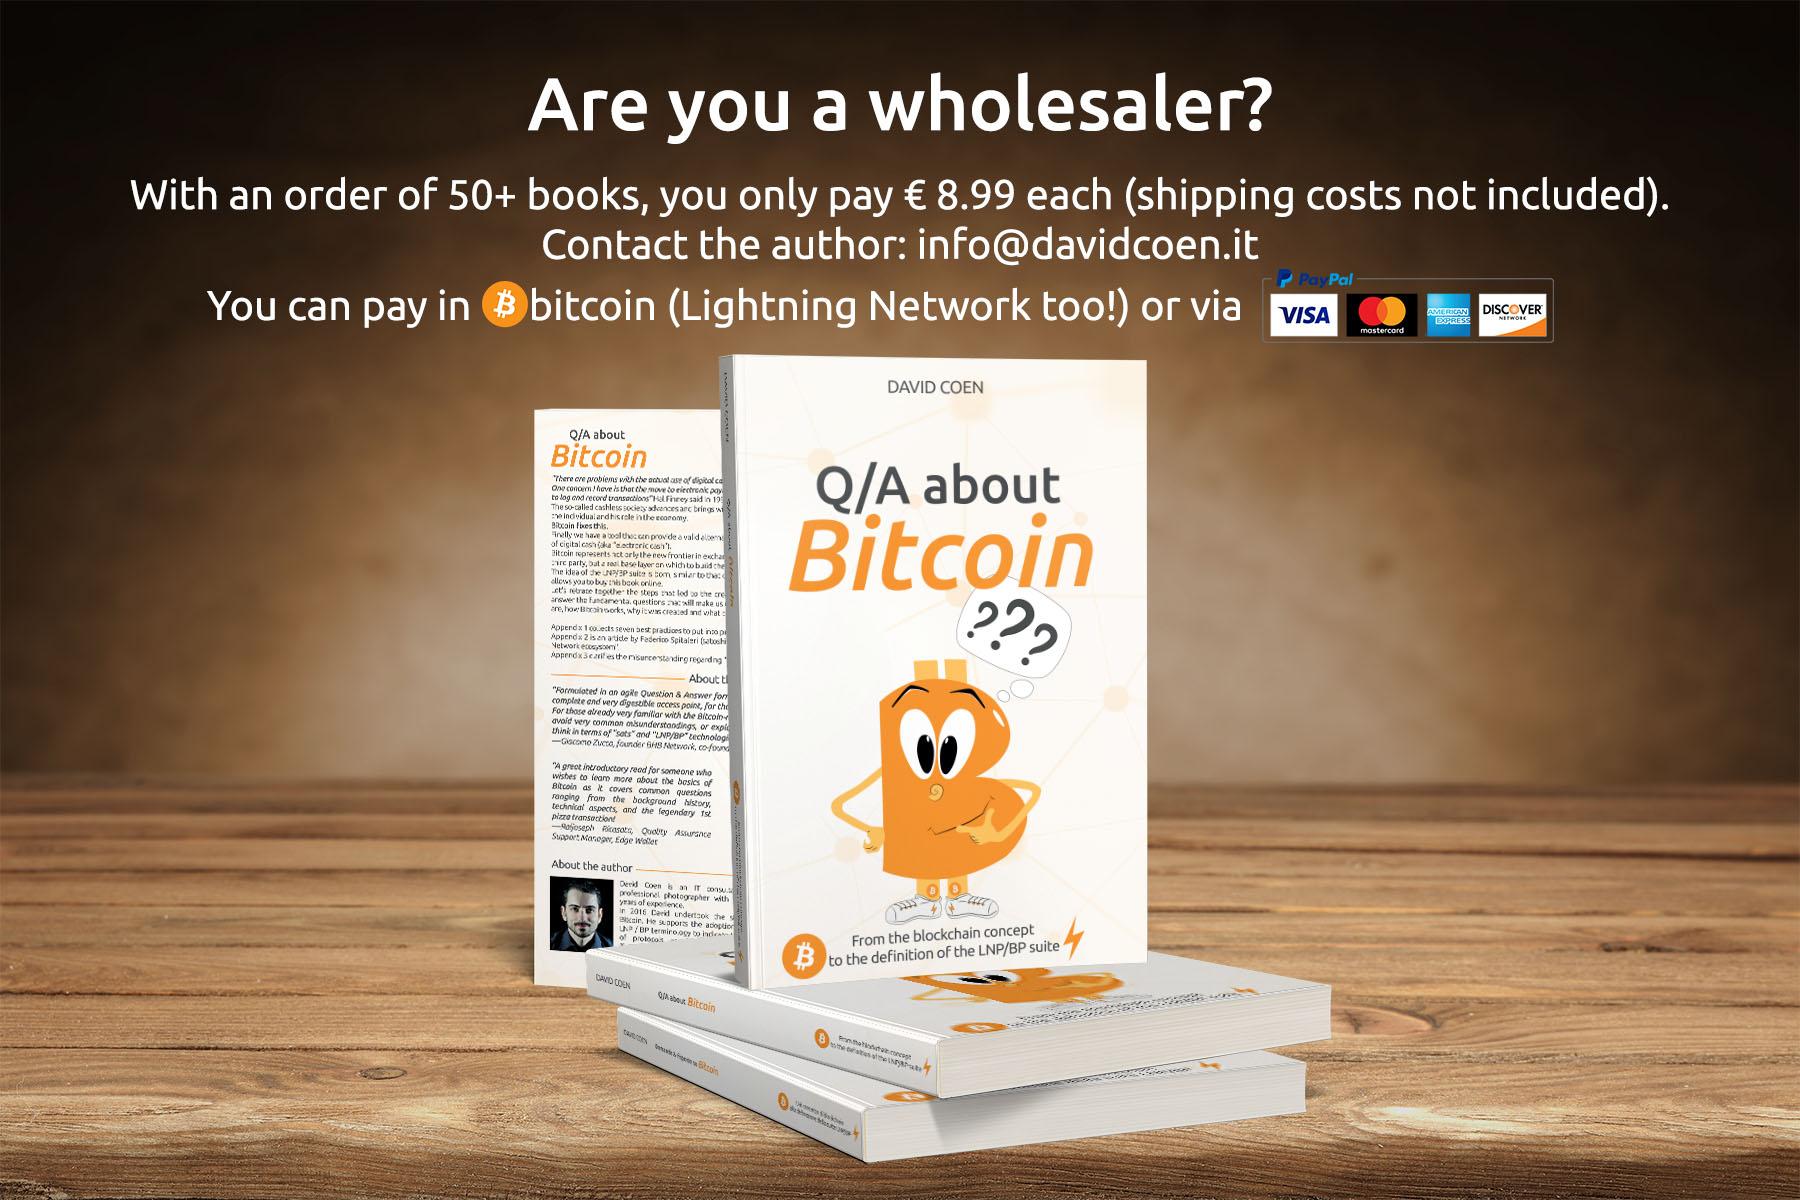 q es prekybininkas bitkoinais